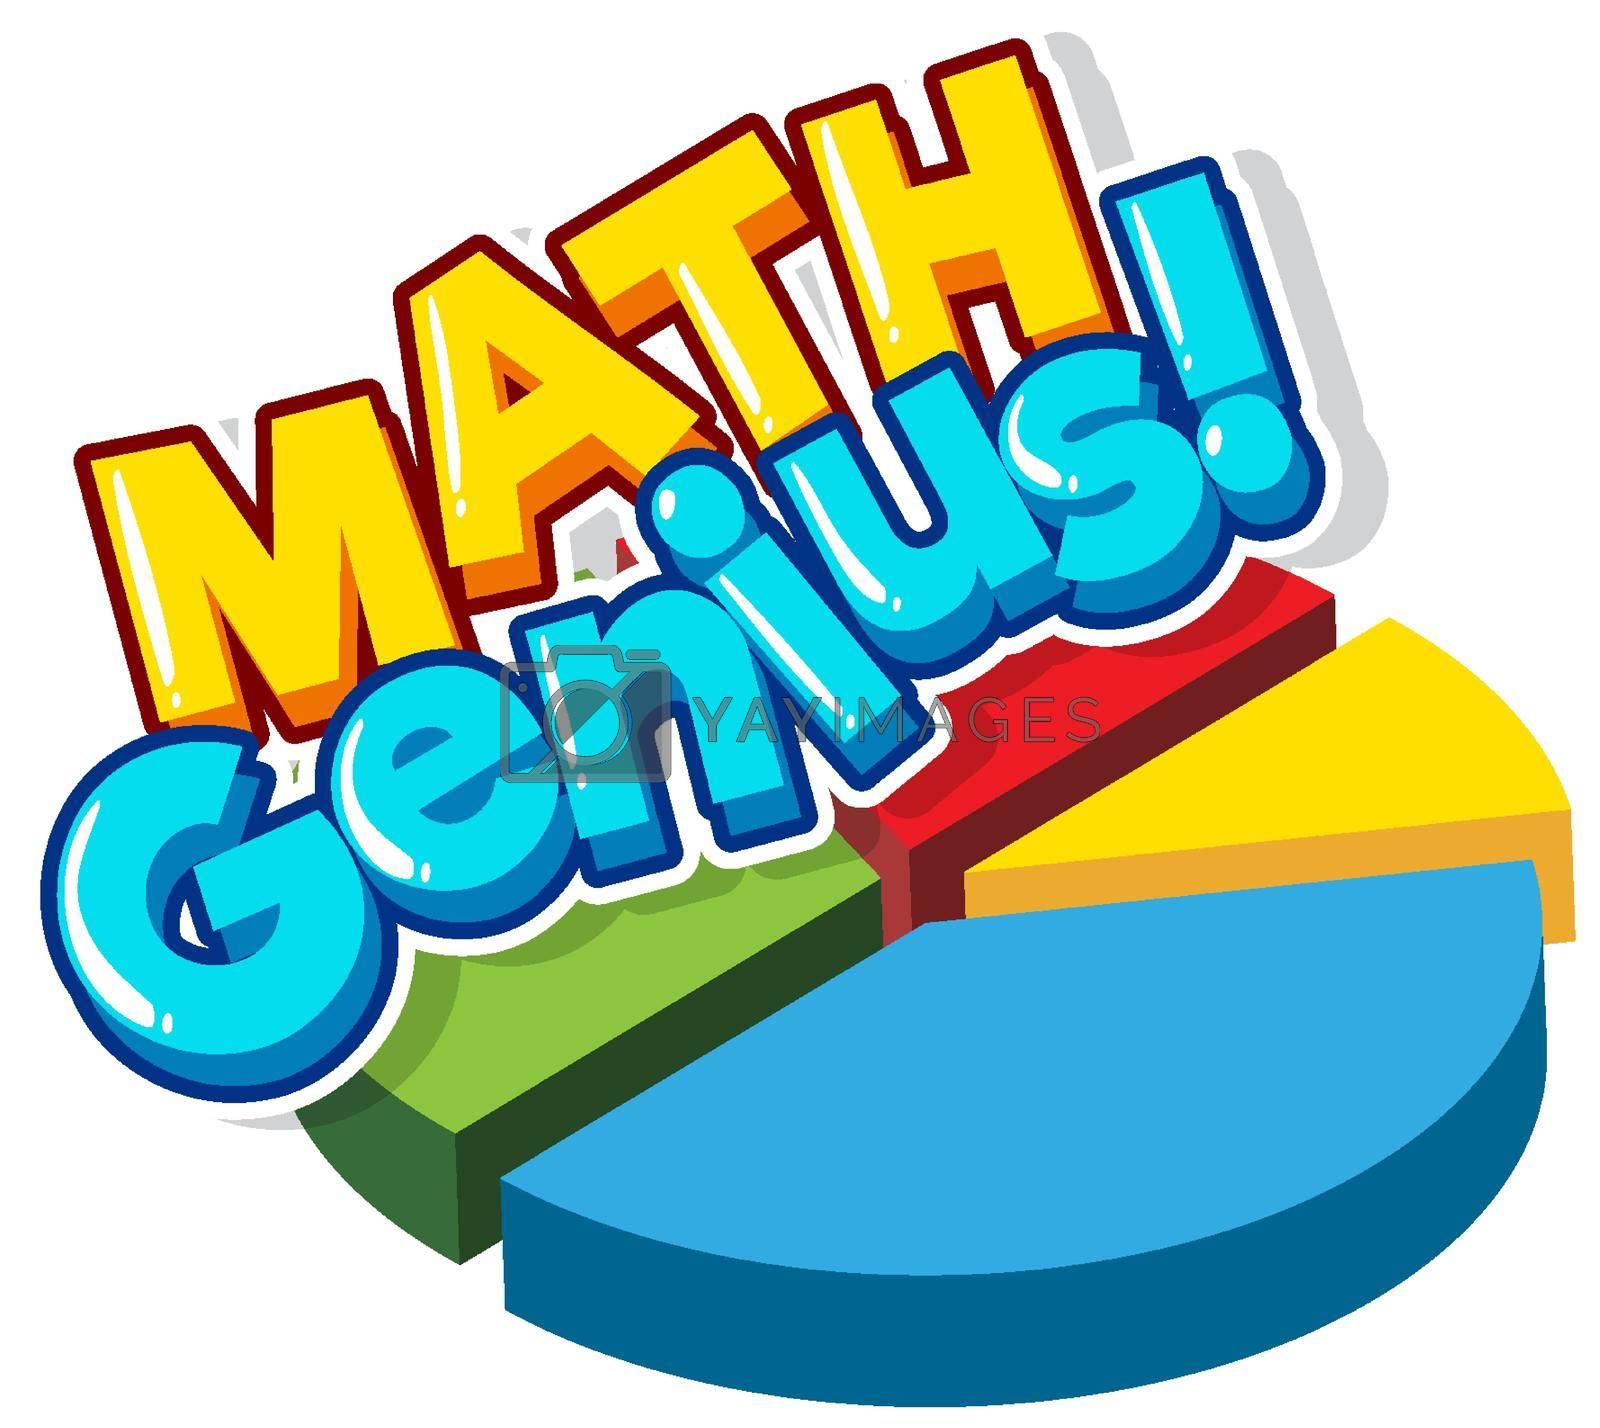 Font design for word math genius with piechart illustration